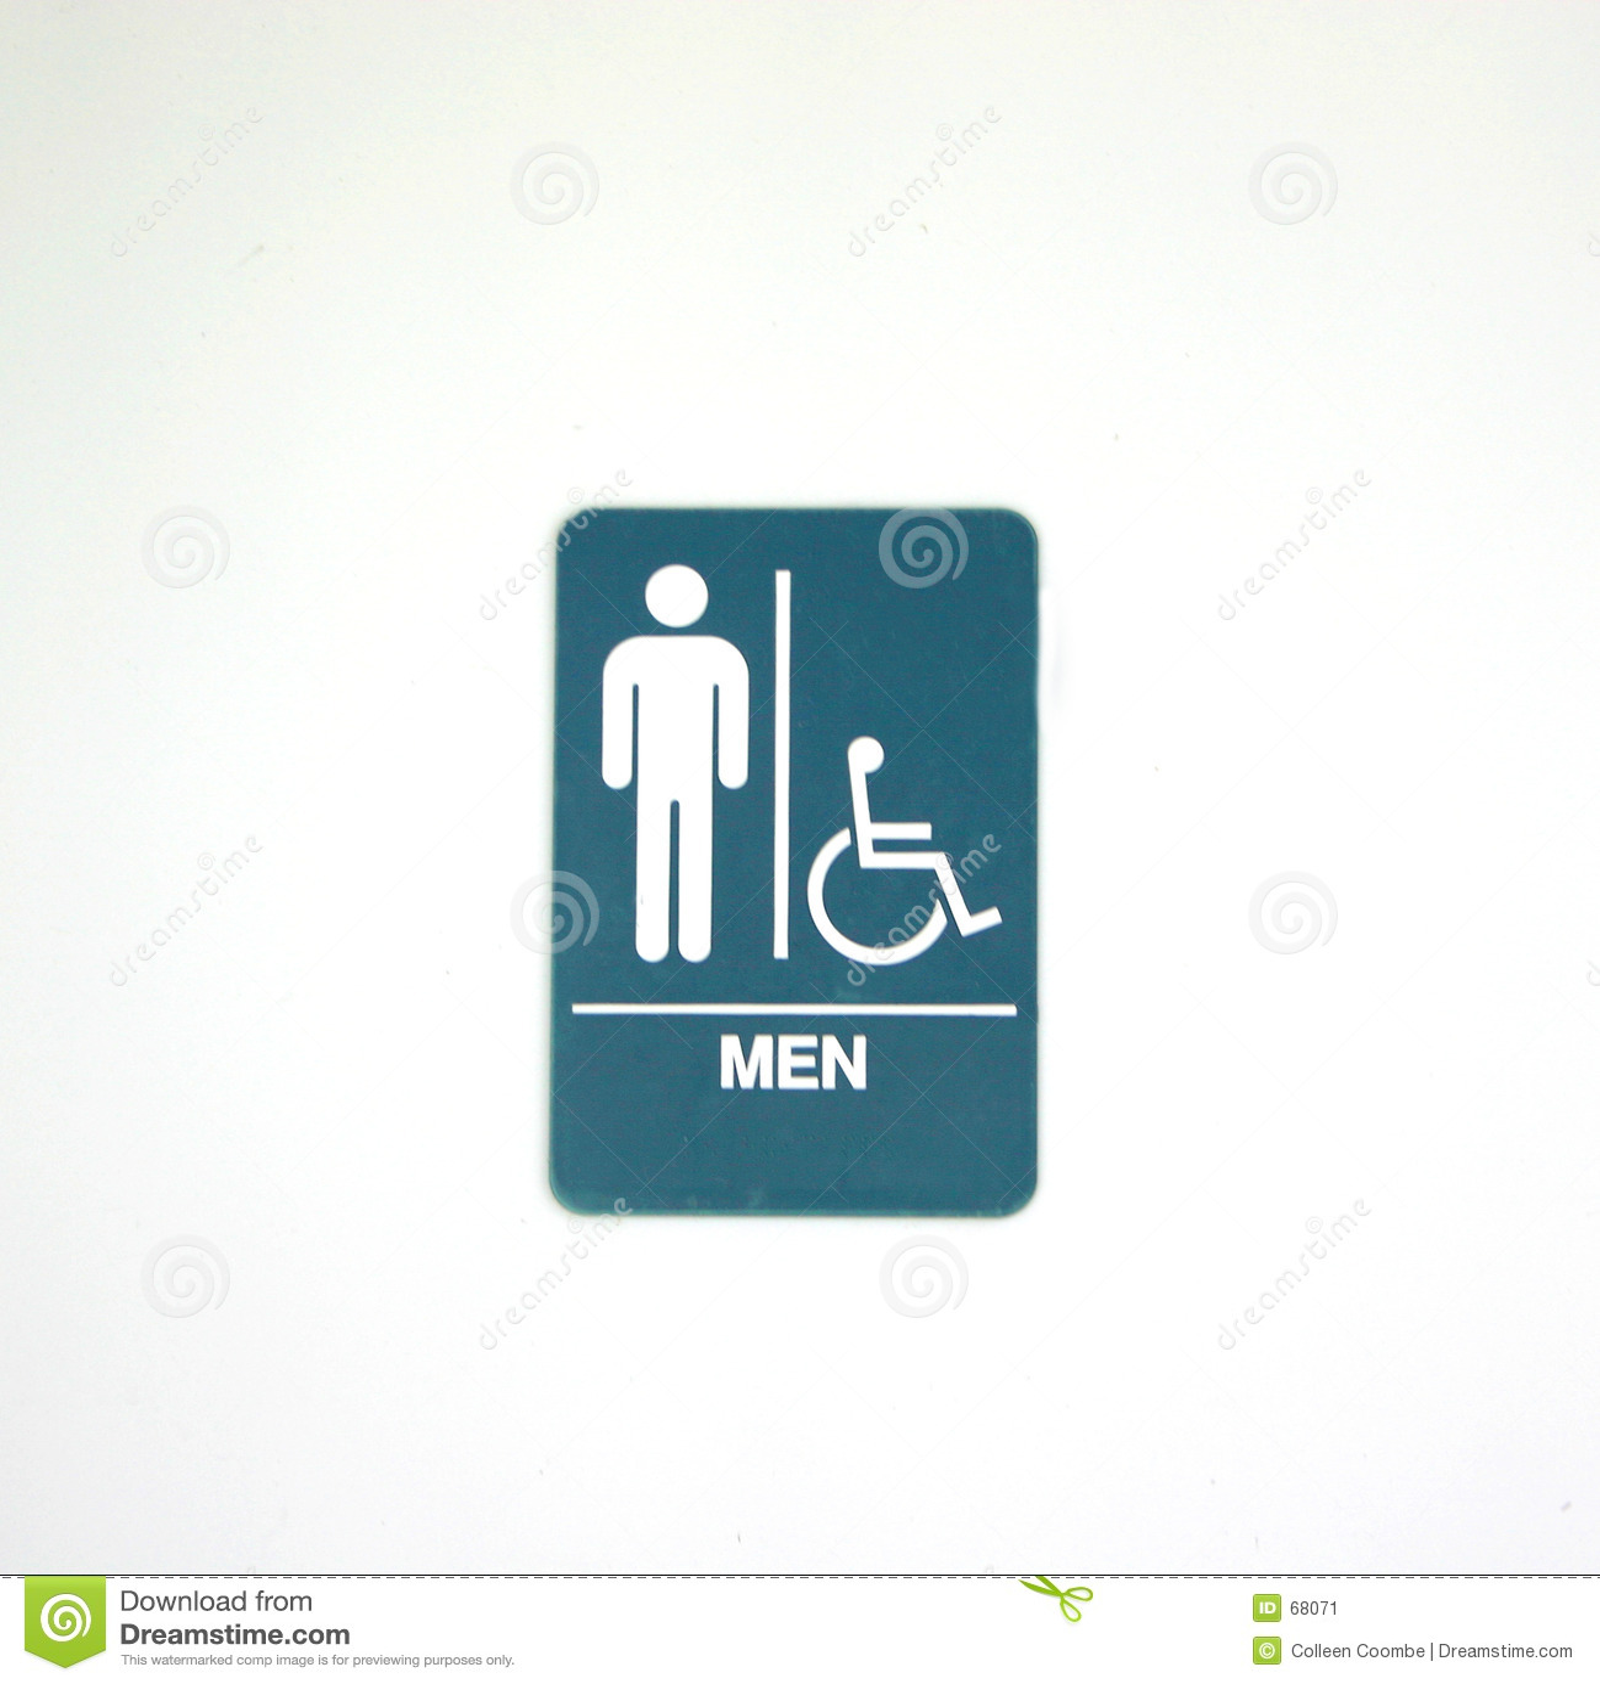 символ комнаты людей s